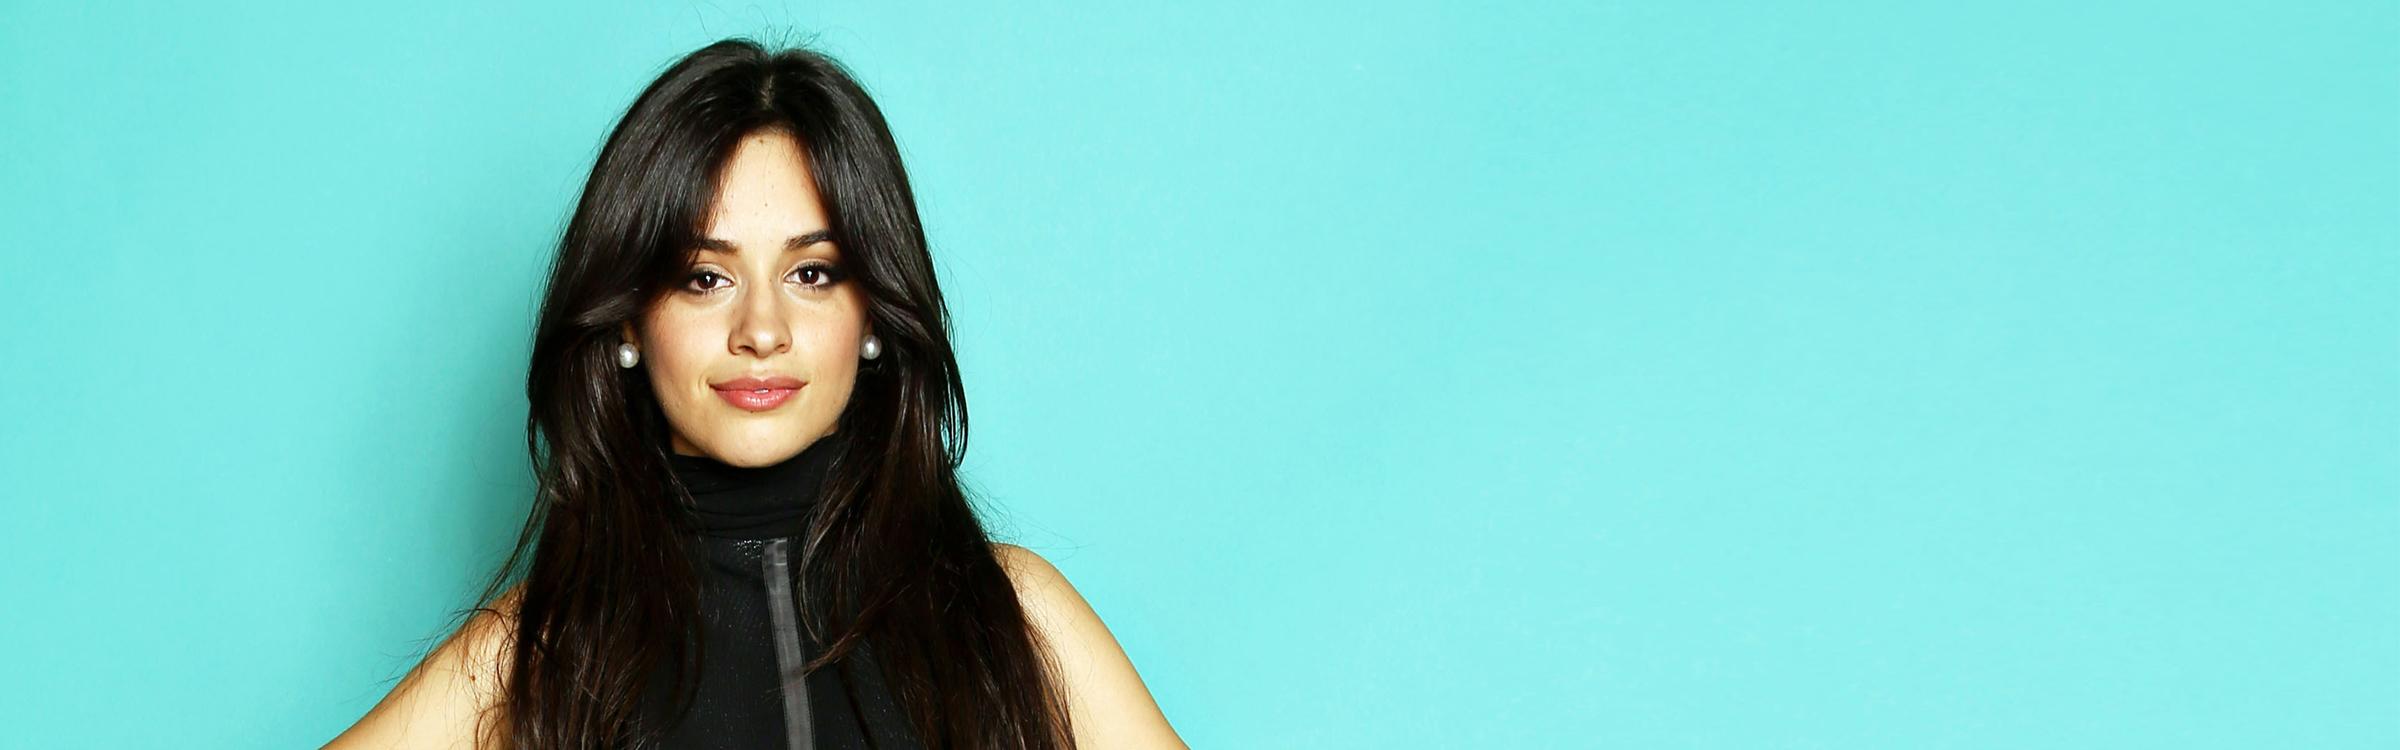 Camila angst header